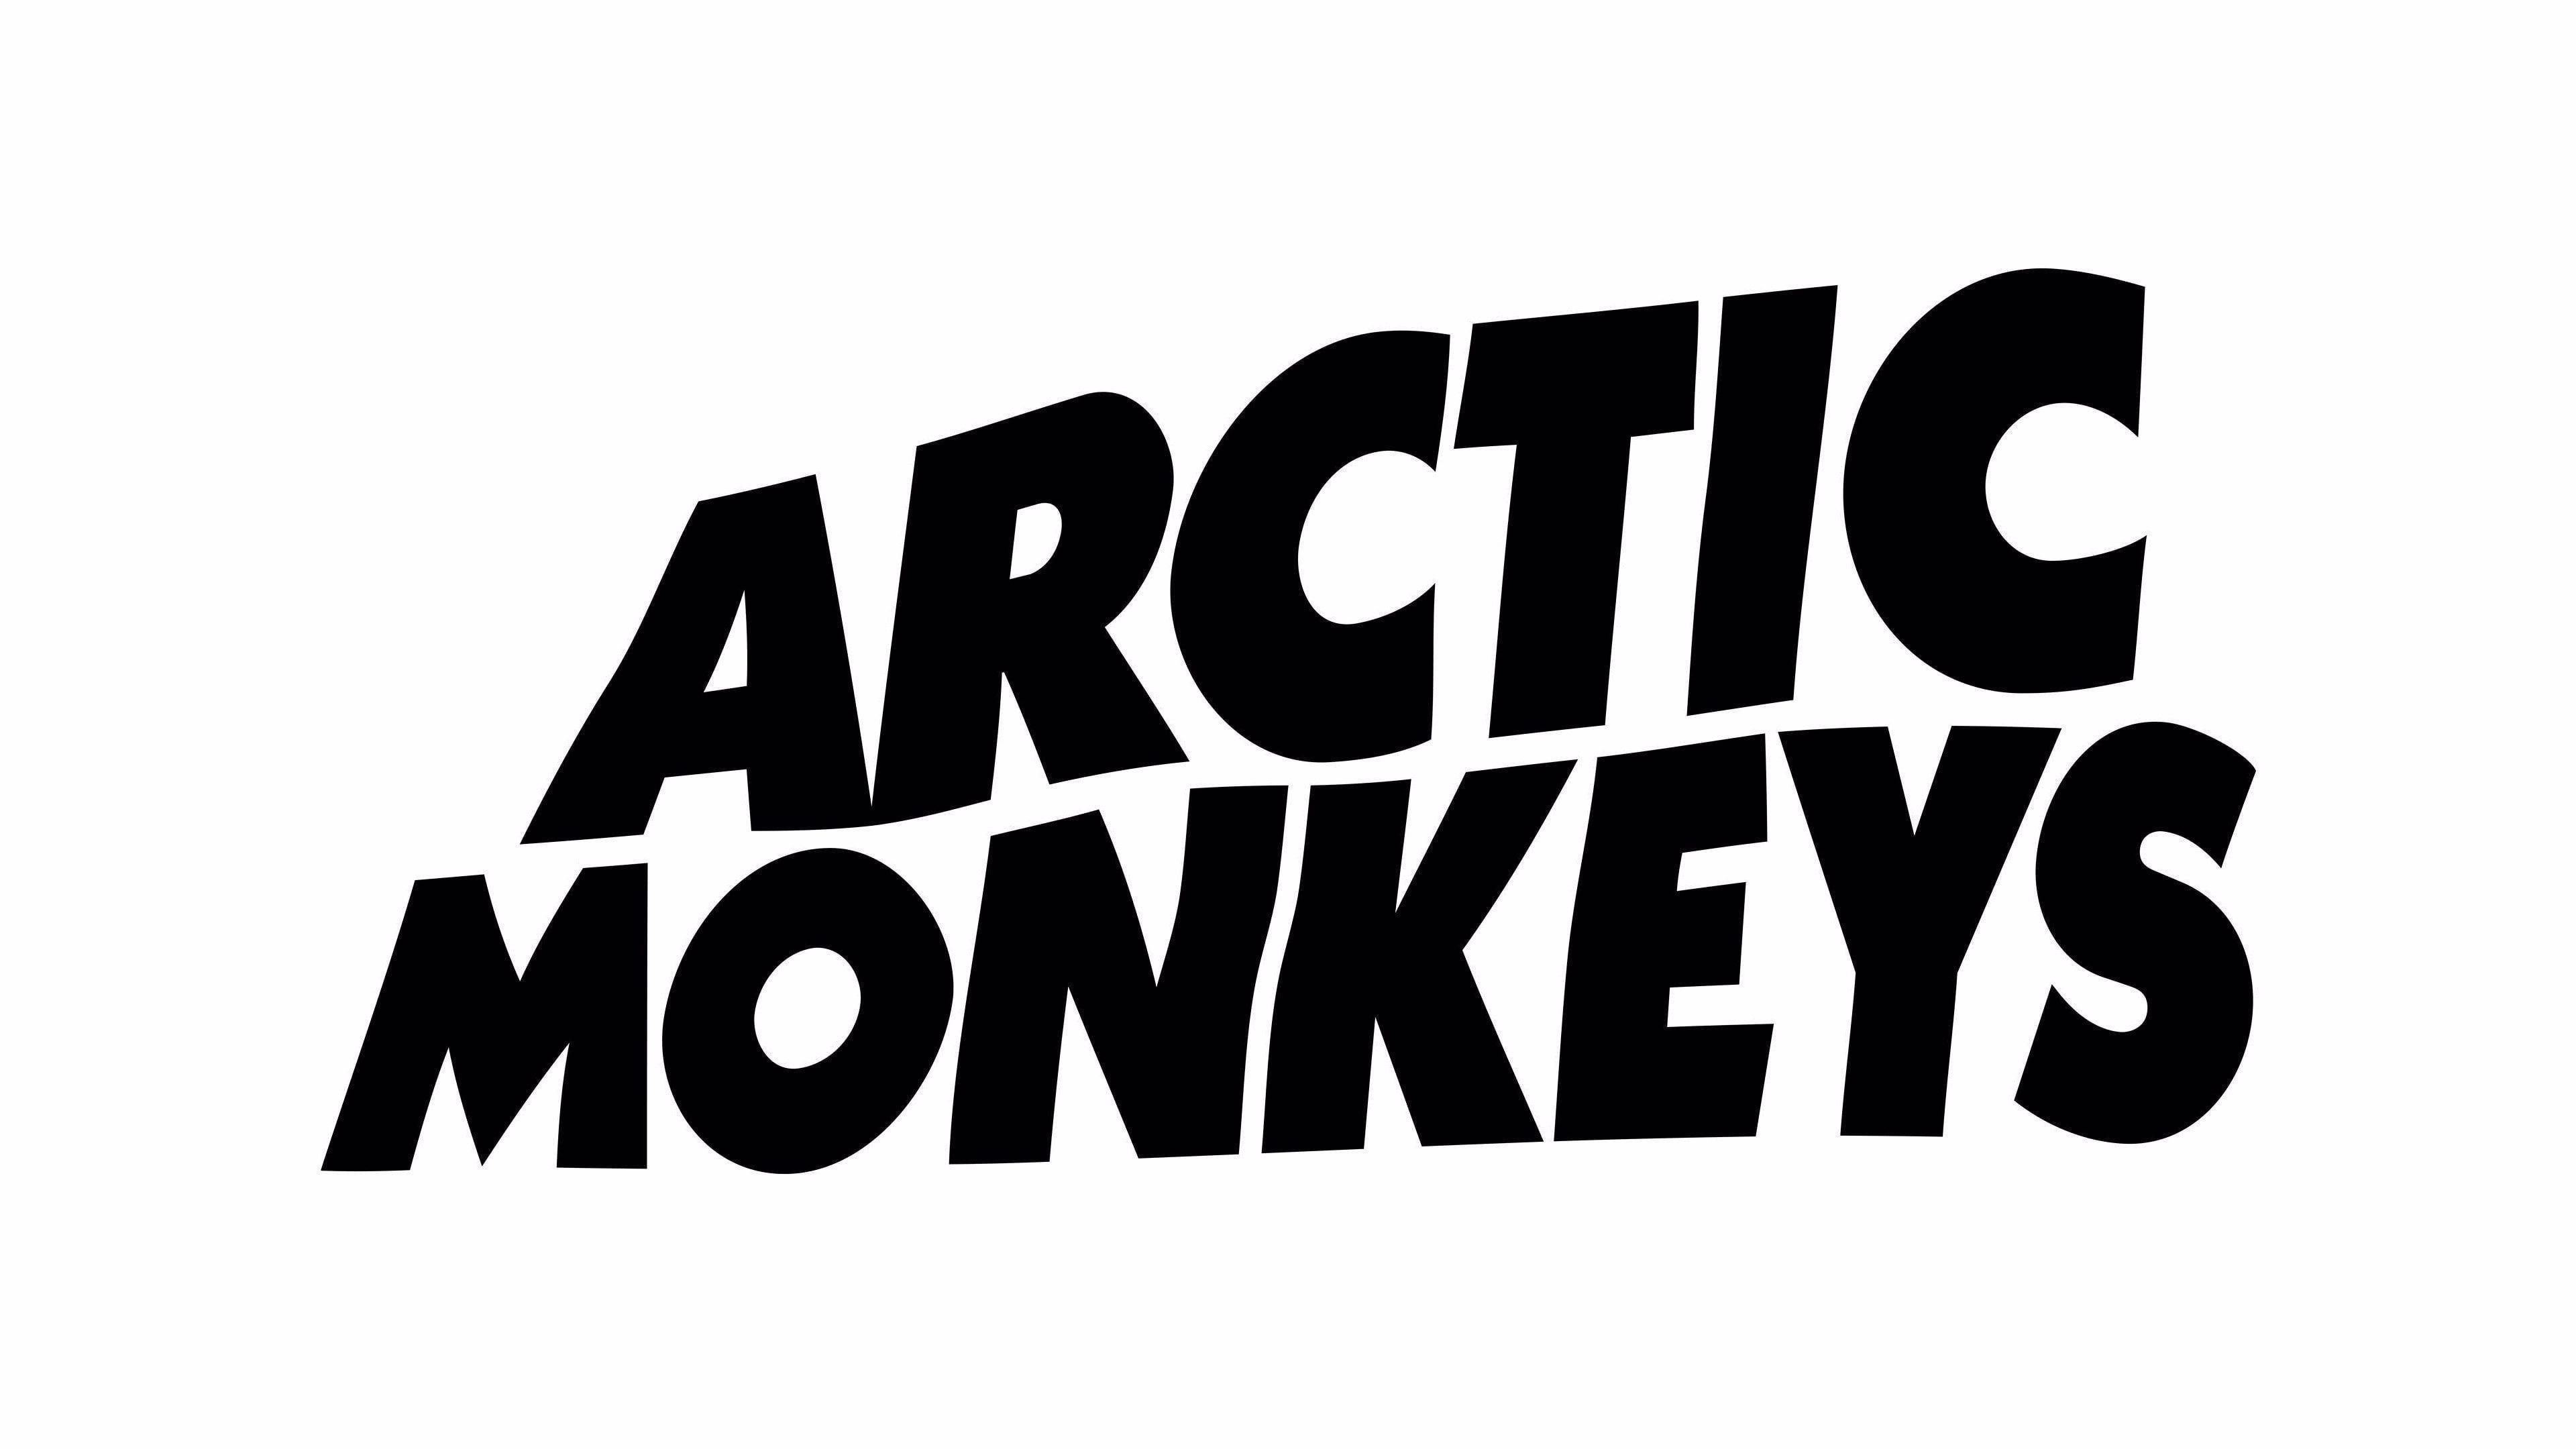 Arctic Monkeys Logo 4k Wallpaper Hdwallpaper Desktop Imac Desktop Ideas Imac Desktop Ideas Of Imac Desktop Imac Arctic Monkeys Monkey Logo Arctic